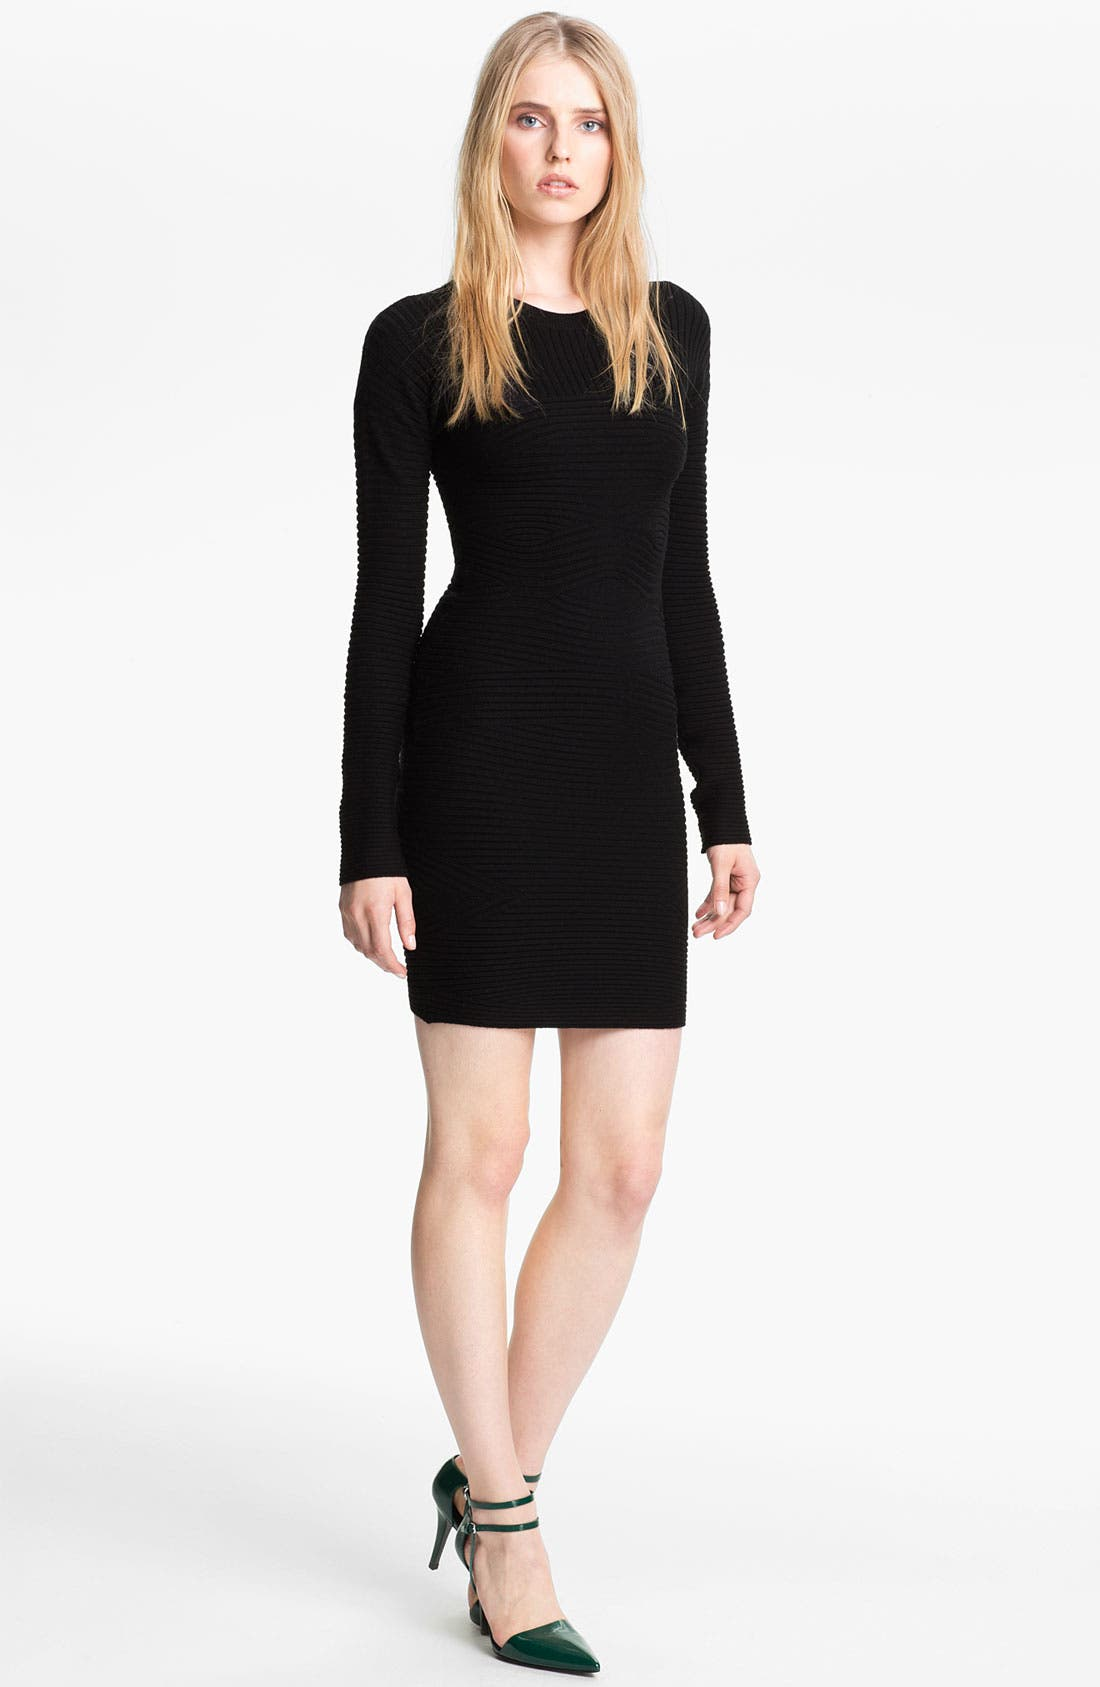 Alternate Image 1 Selected - Alexander Wang Rib Knit Dress